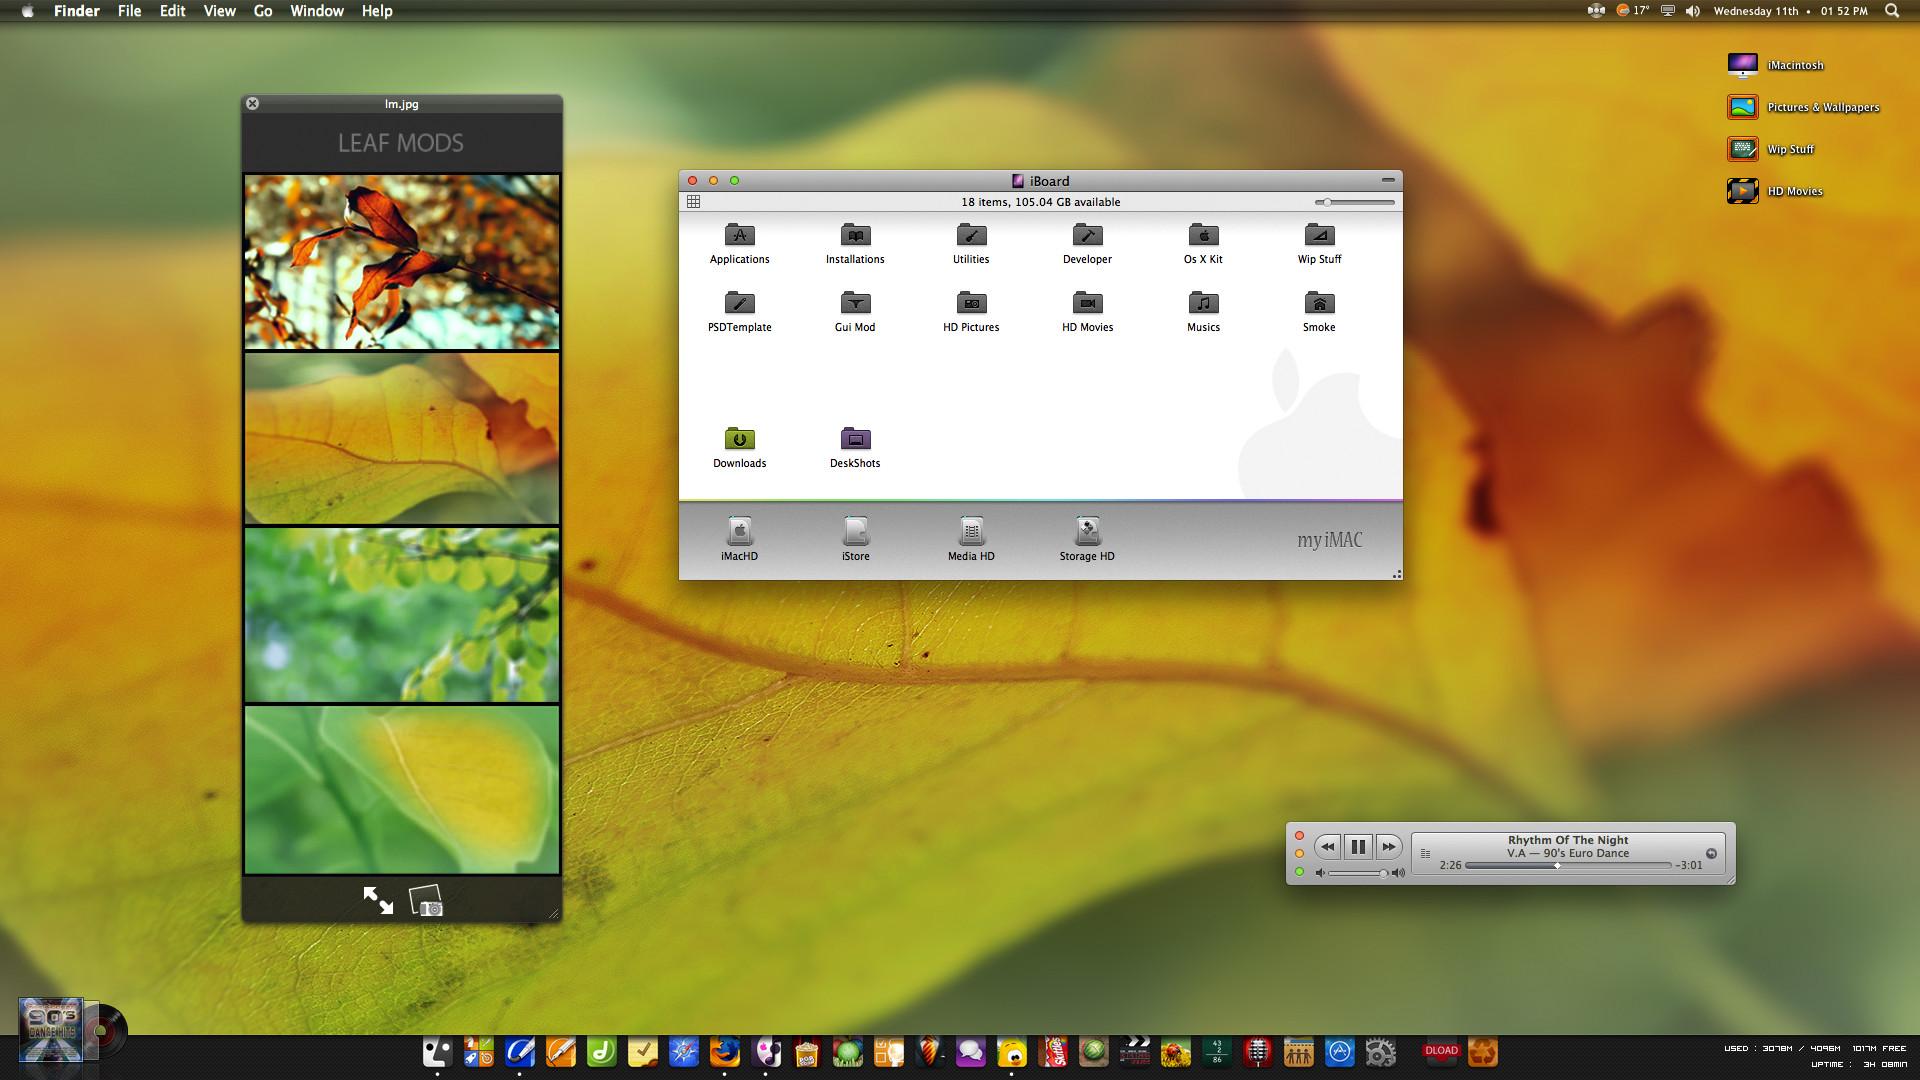 Leaf Mods by neodesktop